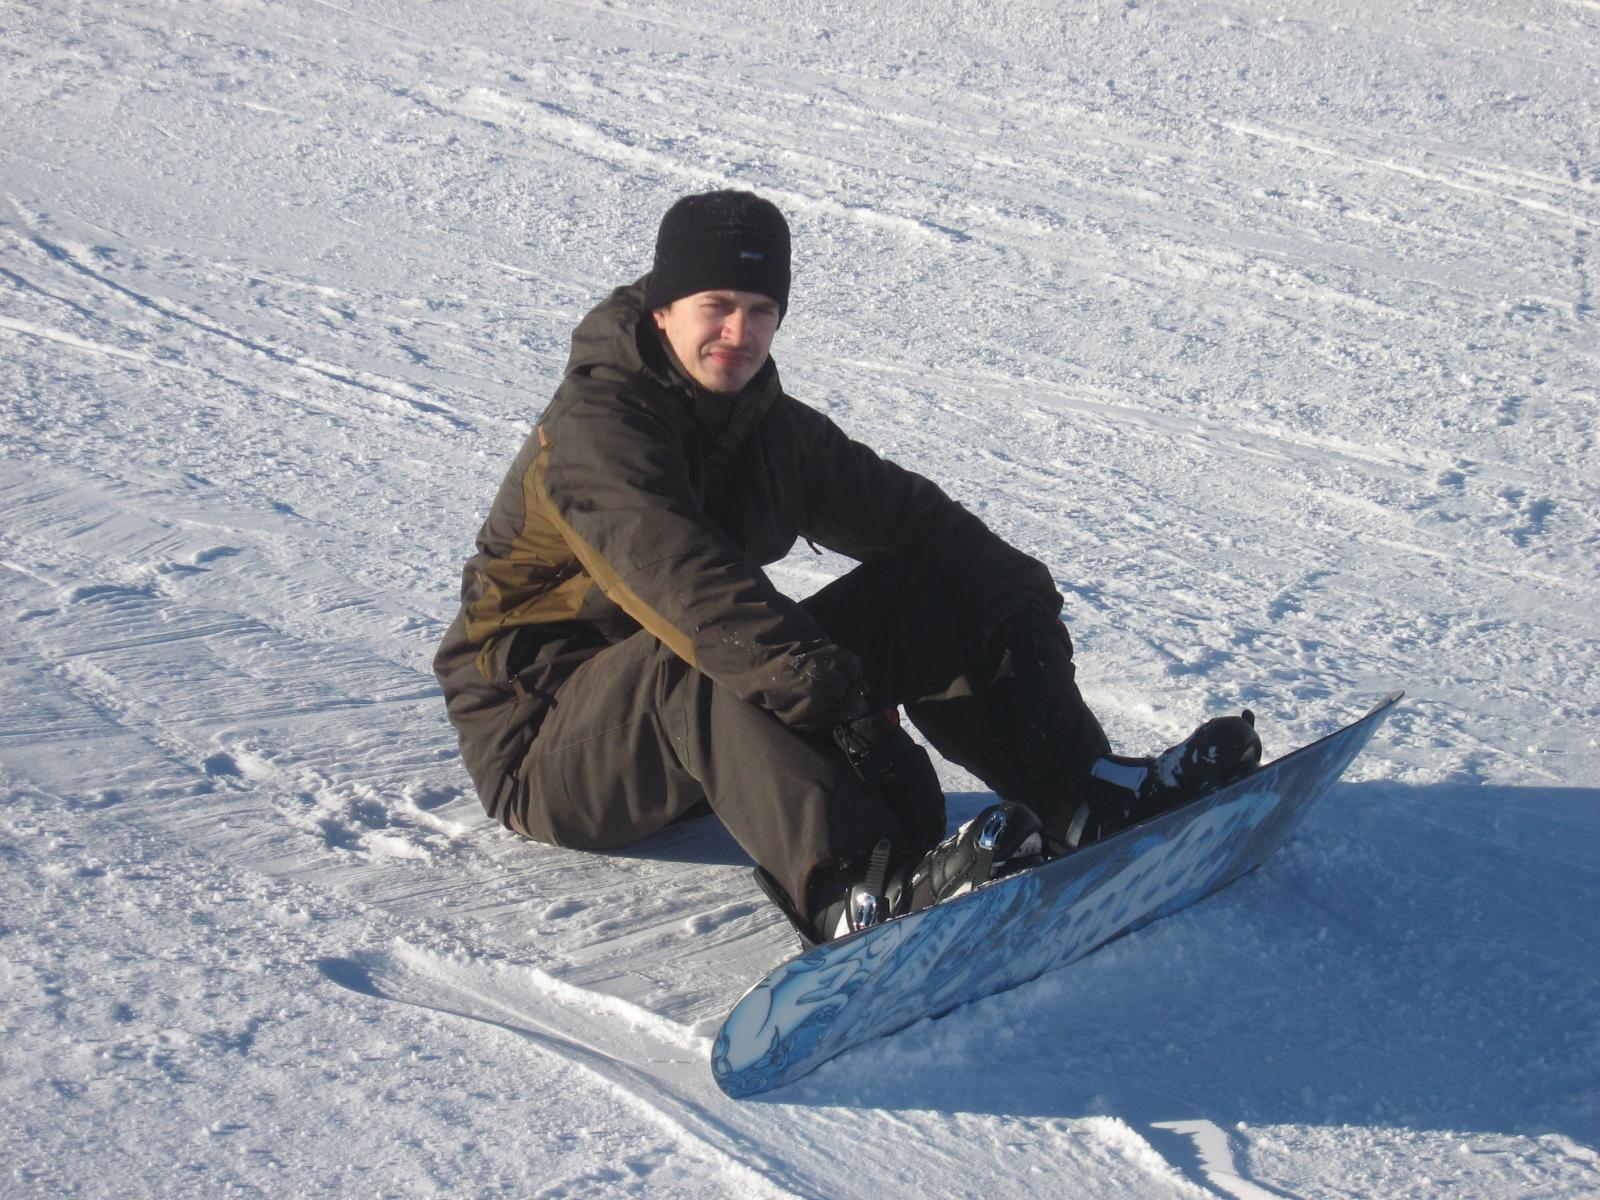 France - snowboarding